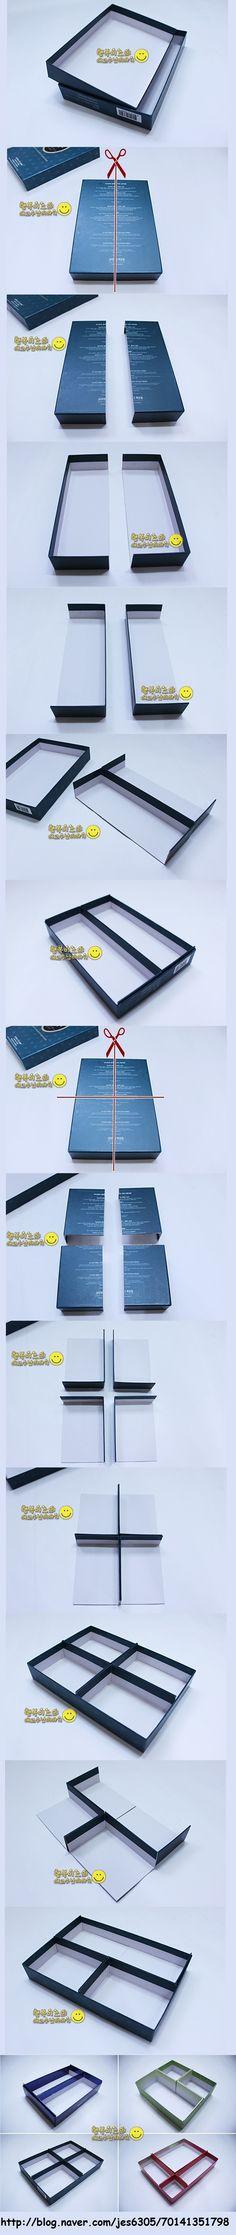 shoe box drawer dividers